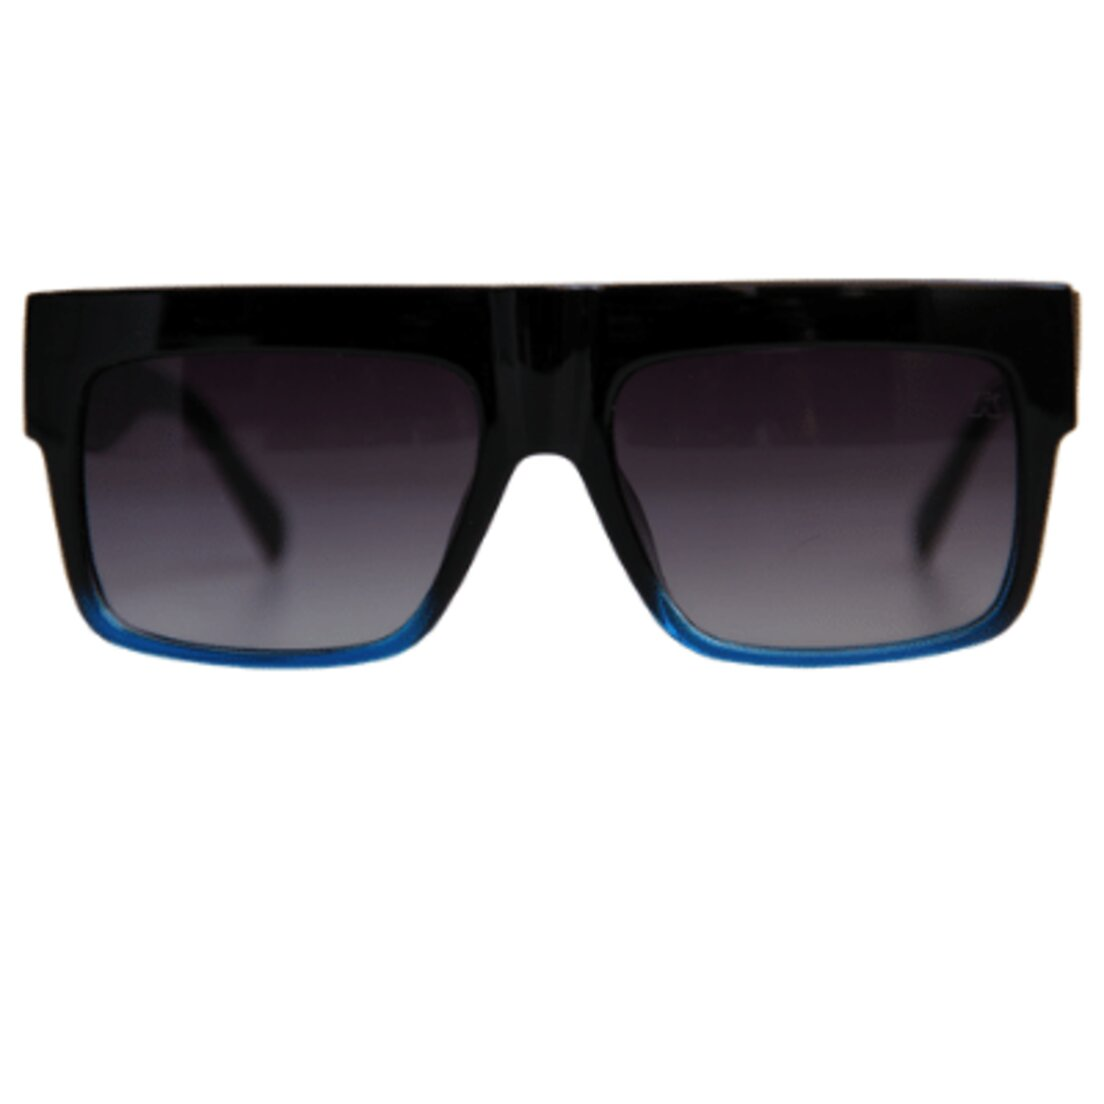 Óculos de Sol Khatto Square Genderless Up Italiano- PU